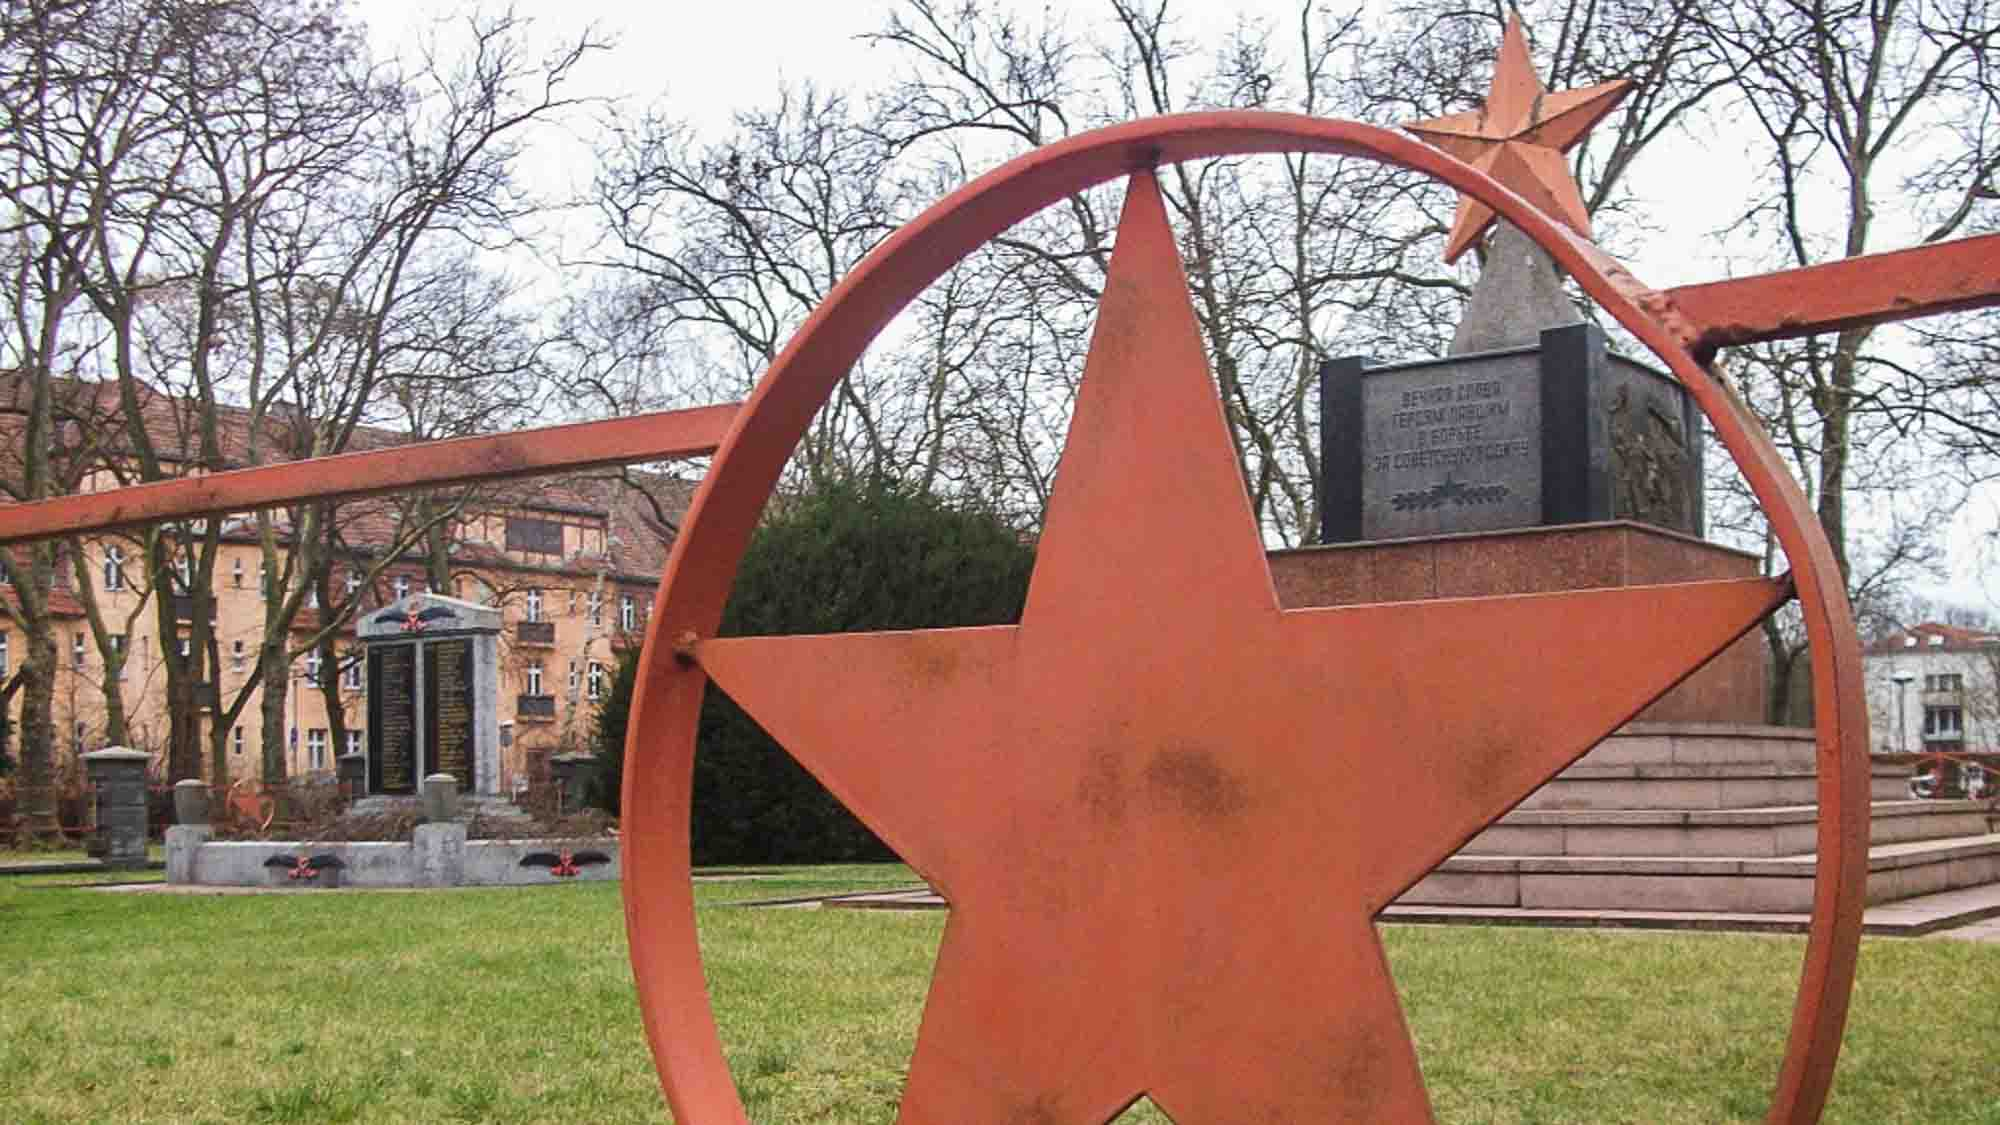 obelisk sowjetischer ehrenfriedhof hennigsdorf rathenaupark